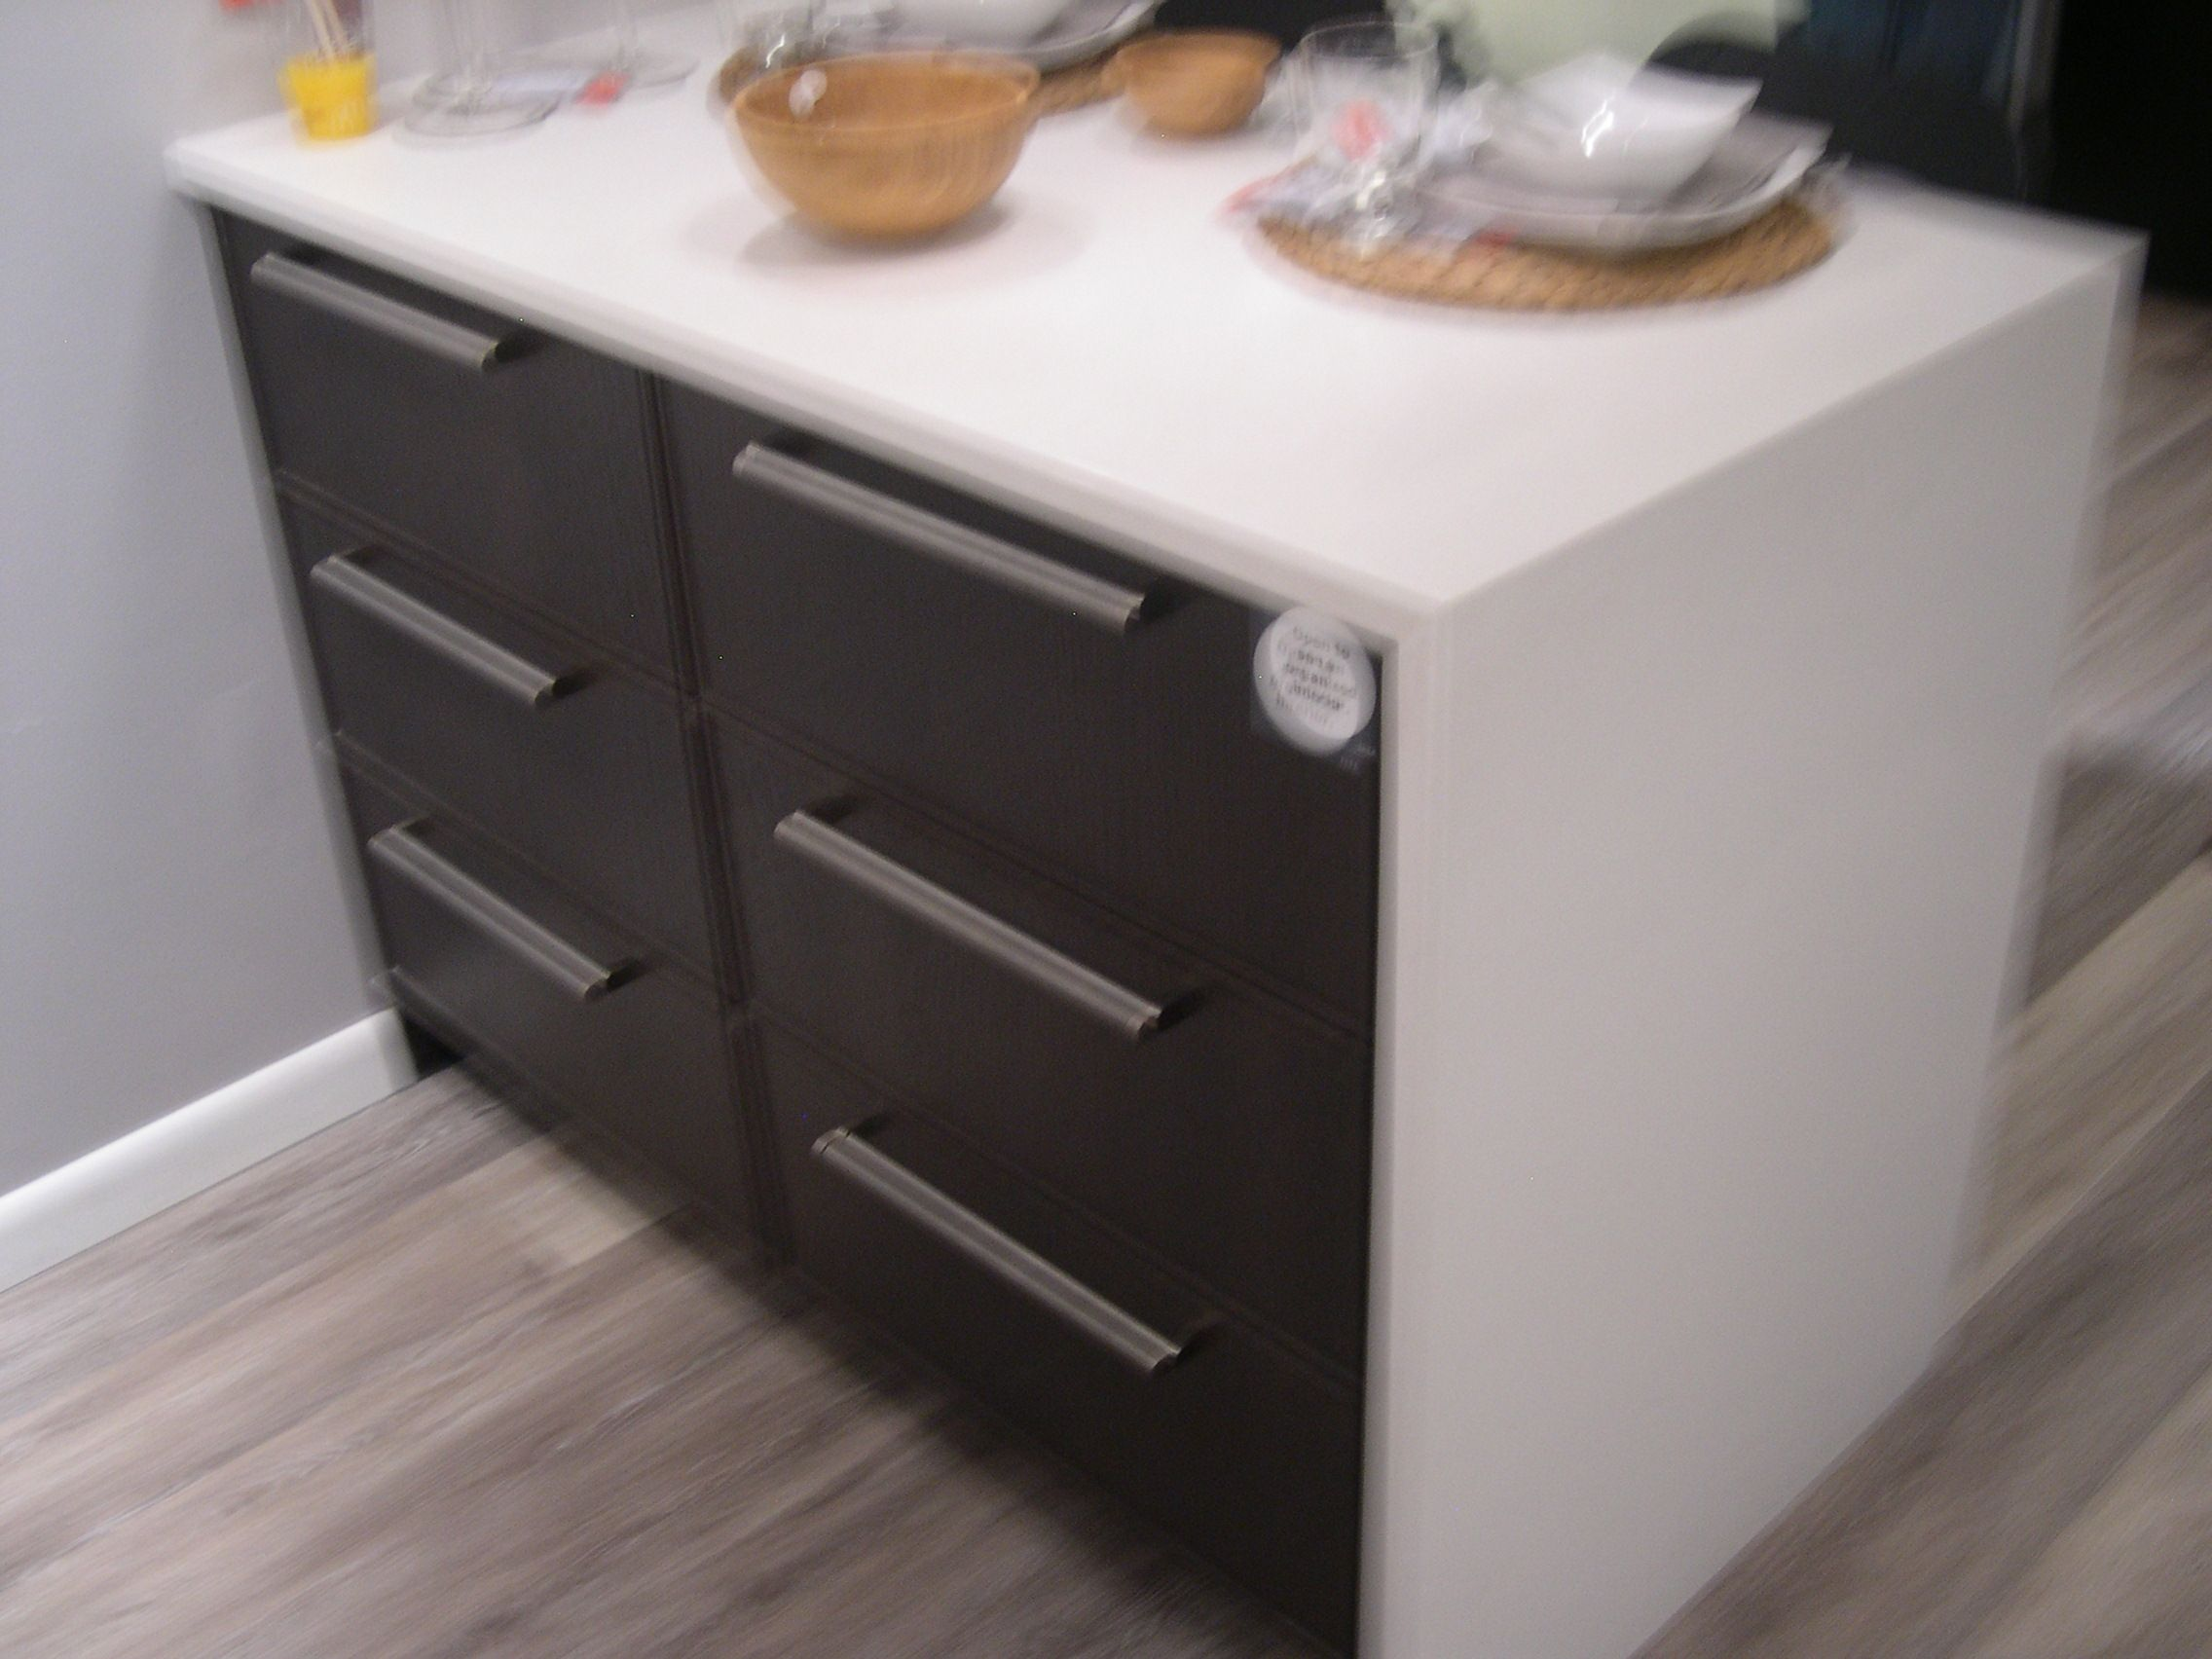 Kitchen Cabinets Could Be Used For Salon Shampoo Backbar Ikea Vanity Kitchen Cabinets Bathroom Vanity